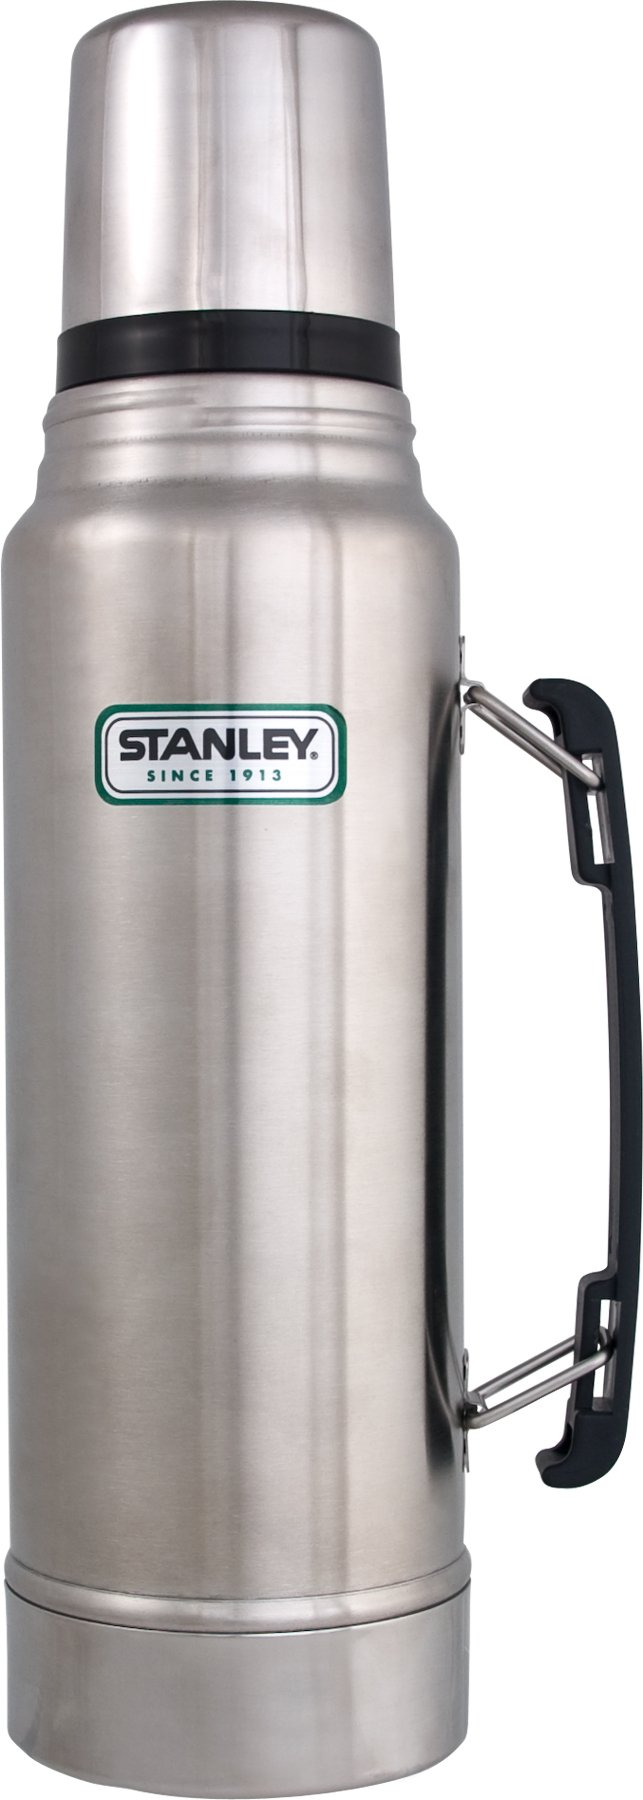 Garrafa Térmica Stanley Classic 1L Inox